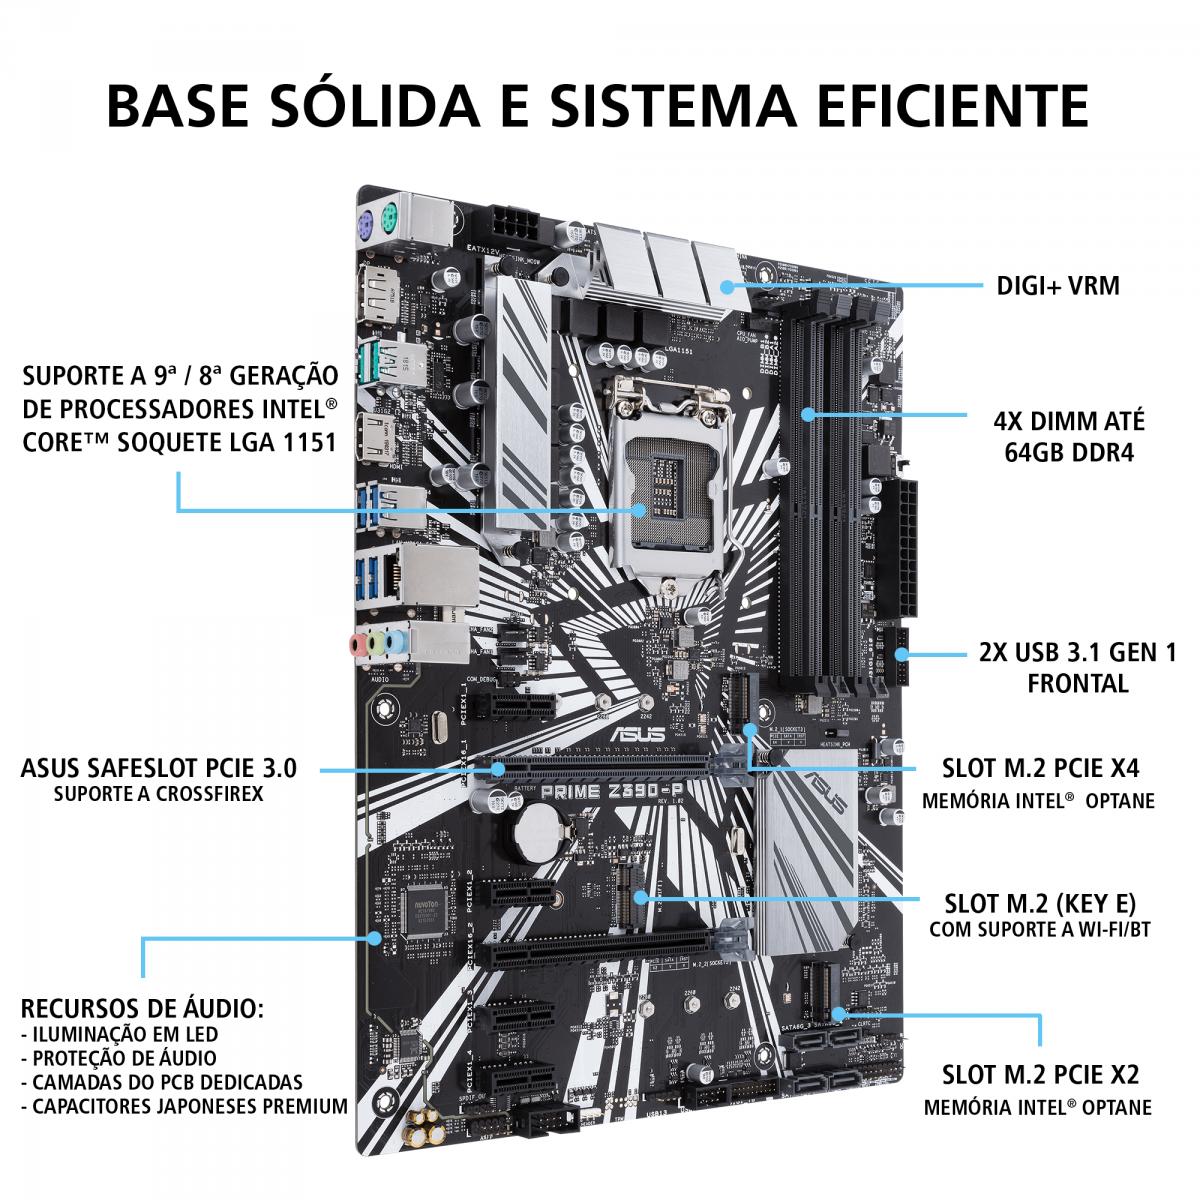 Placa Mãe Asus Prime Z390-P, Chipset Z390, Intel LGA 1151, ATX, DDR4